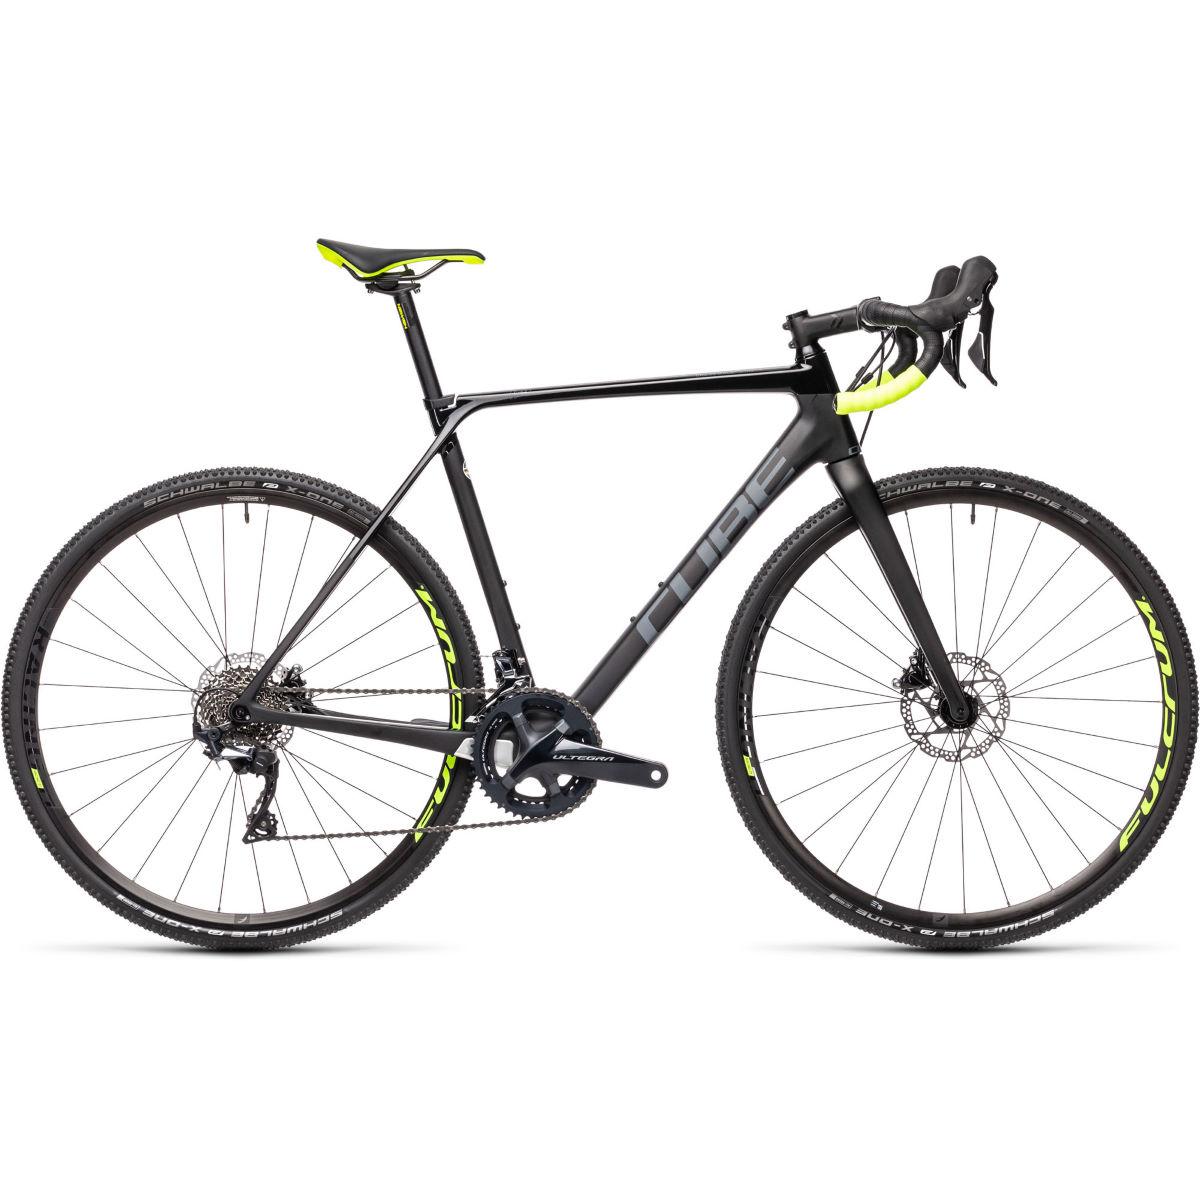 Cube Cross Race C 62 Pro 2021 Bikes